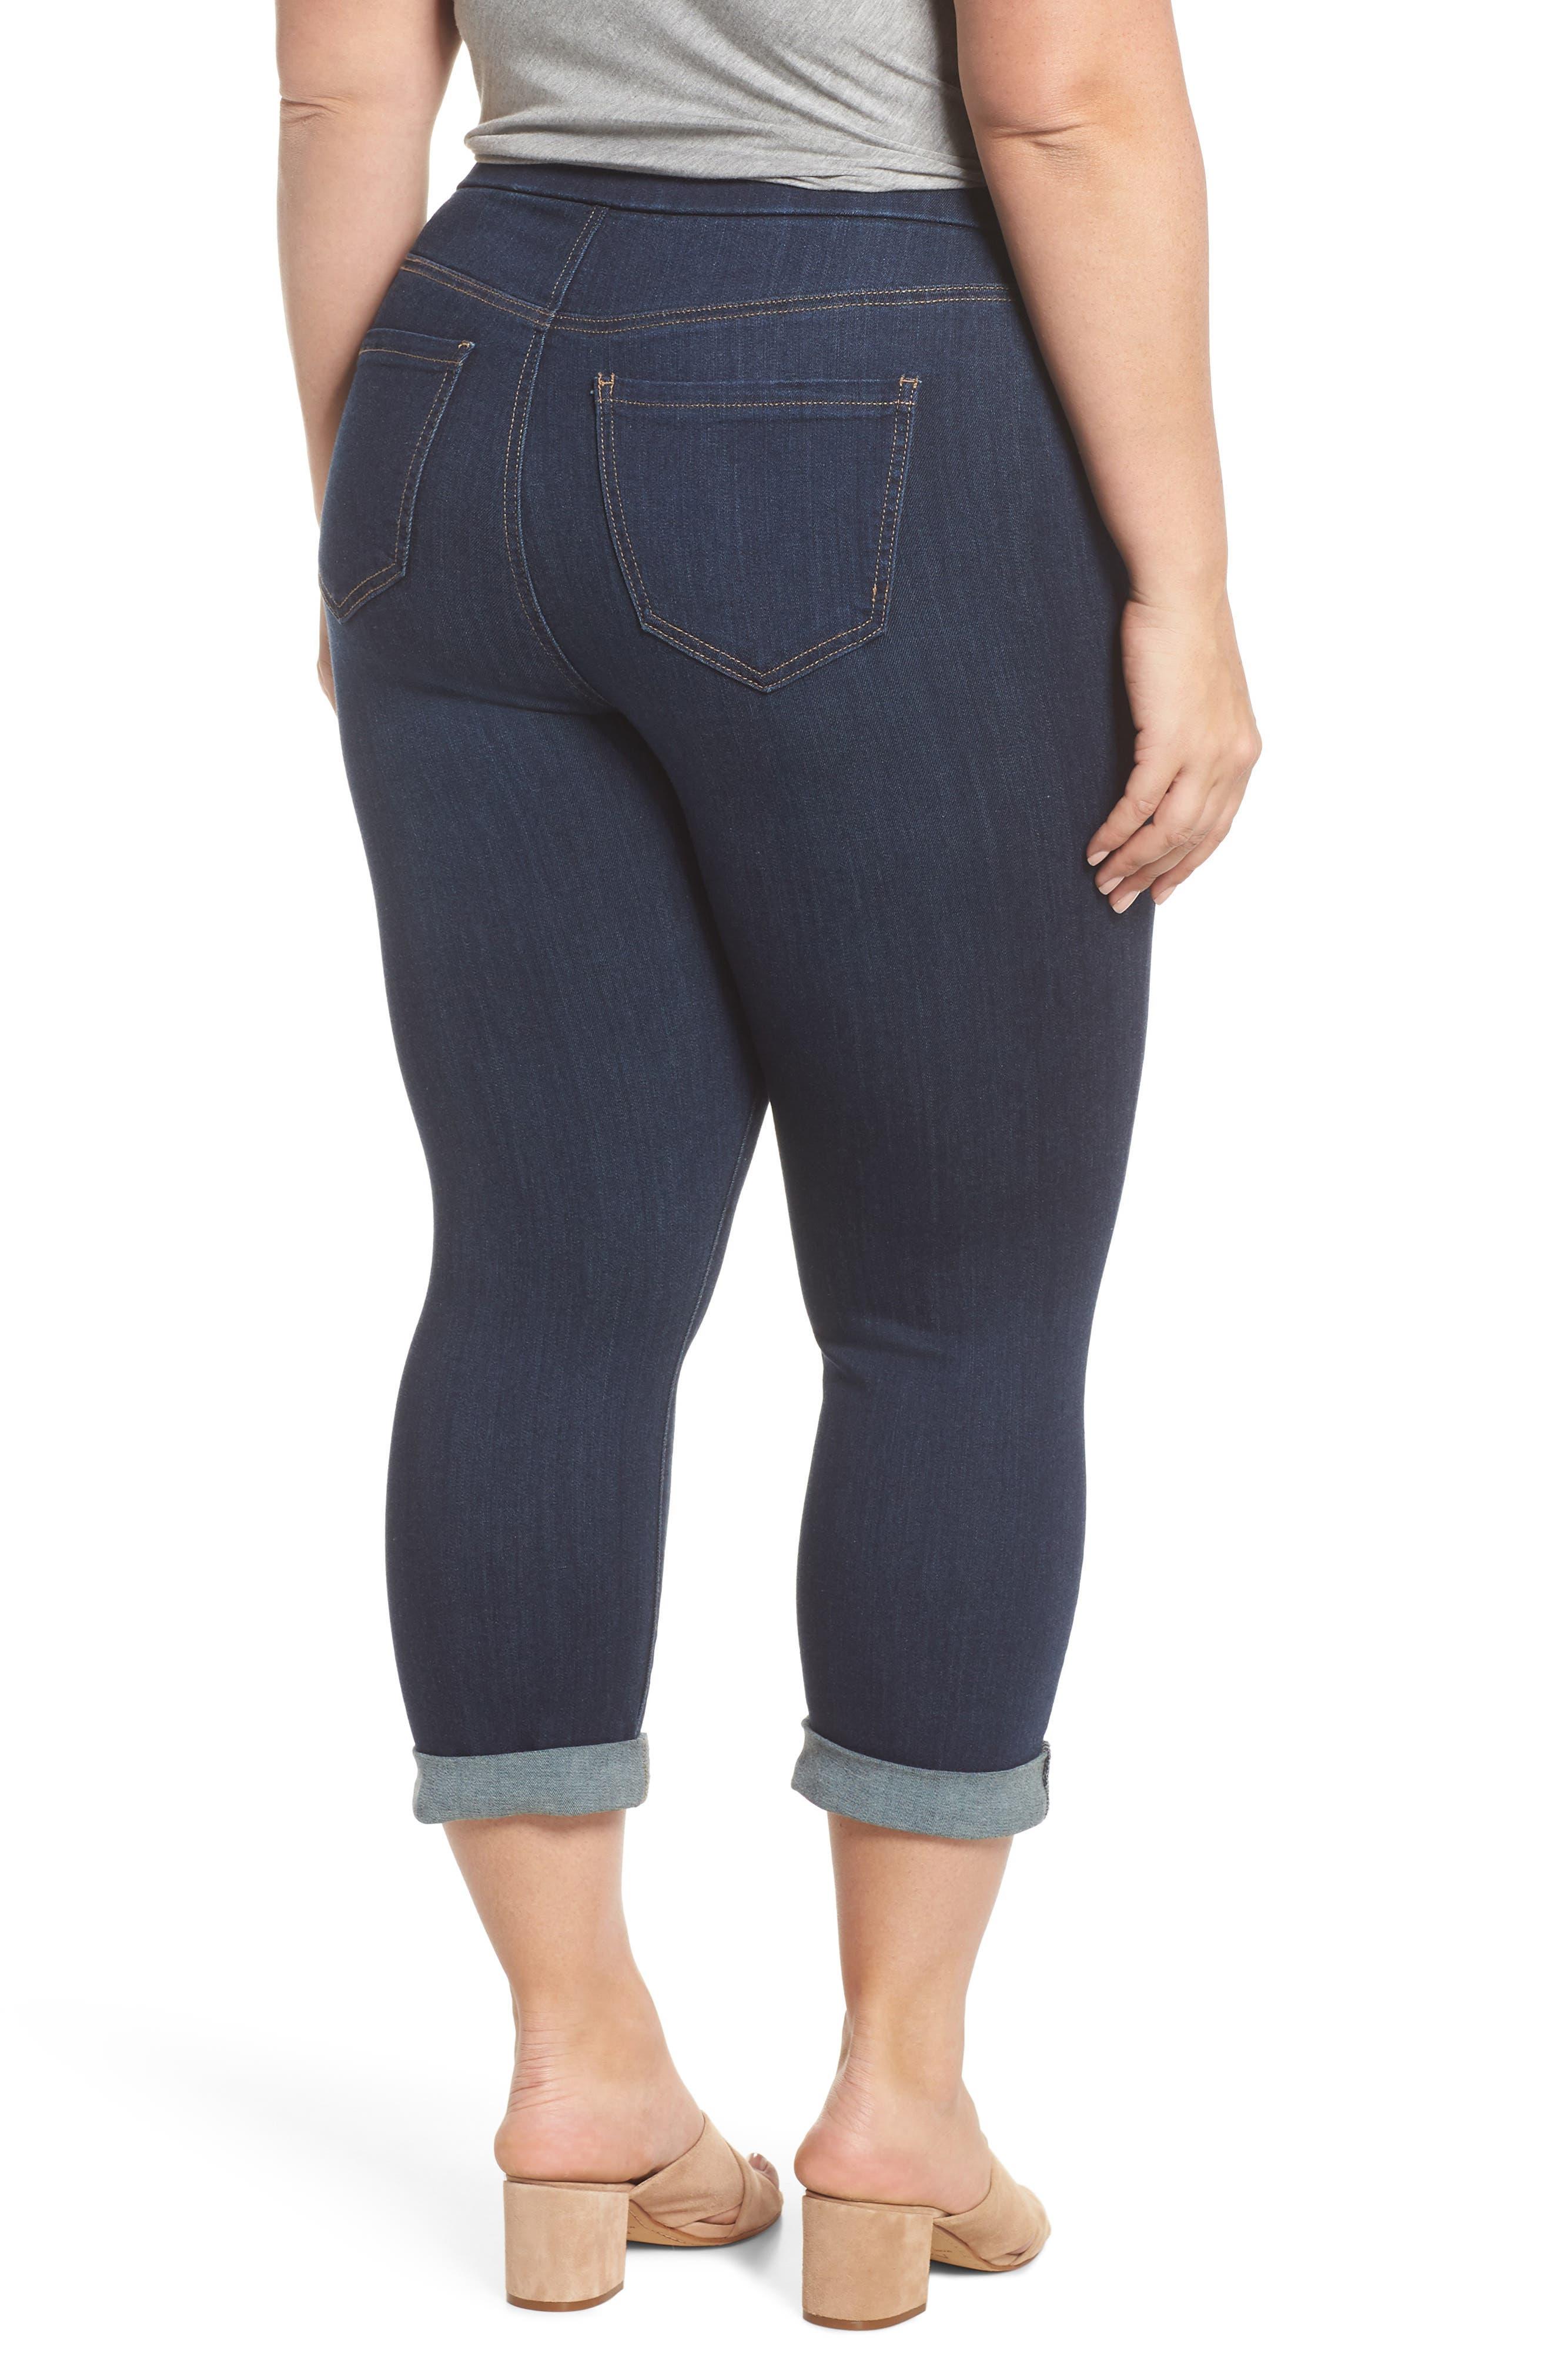 Sienna Pull-On Denim Capri Pants,                             Alternate thumbnail 2, color,                             GRIFFITH SUPER DARK